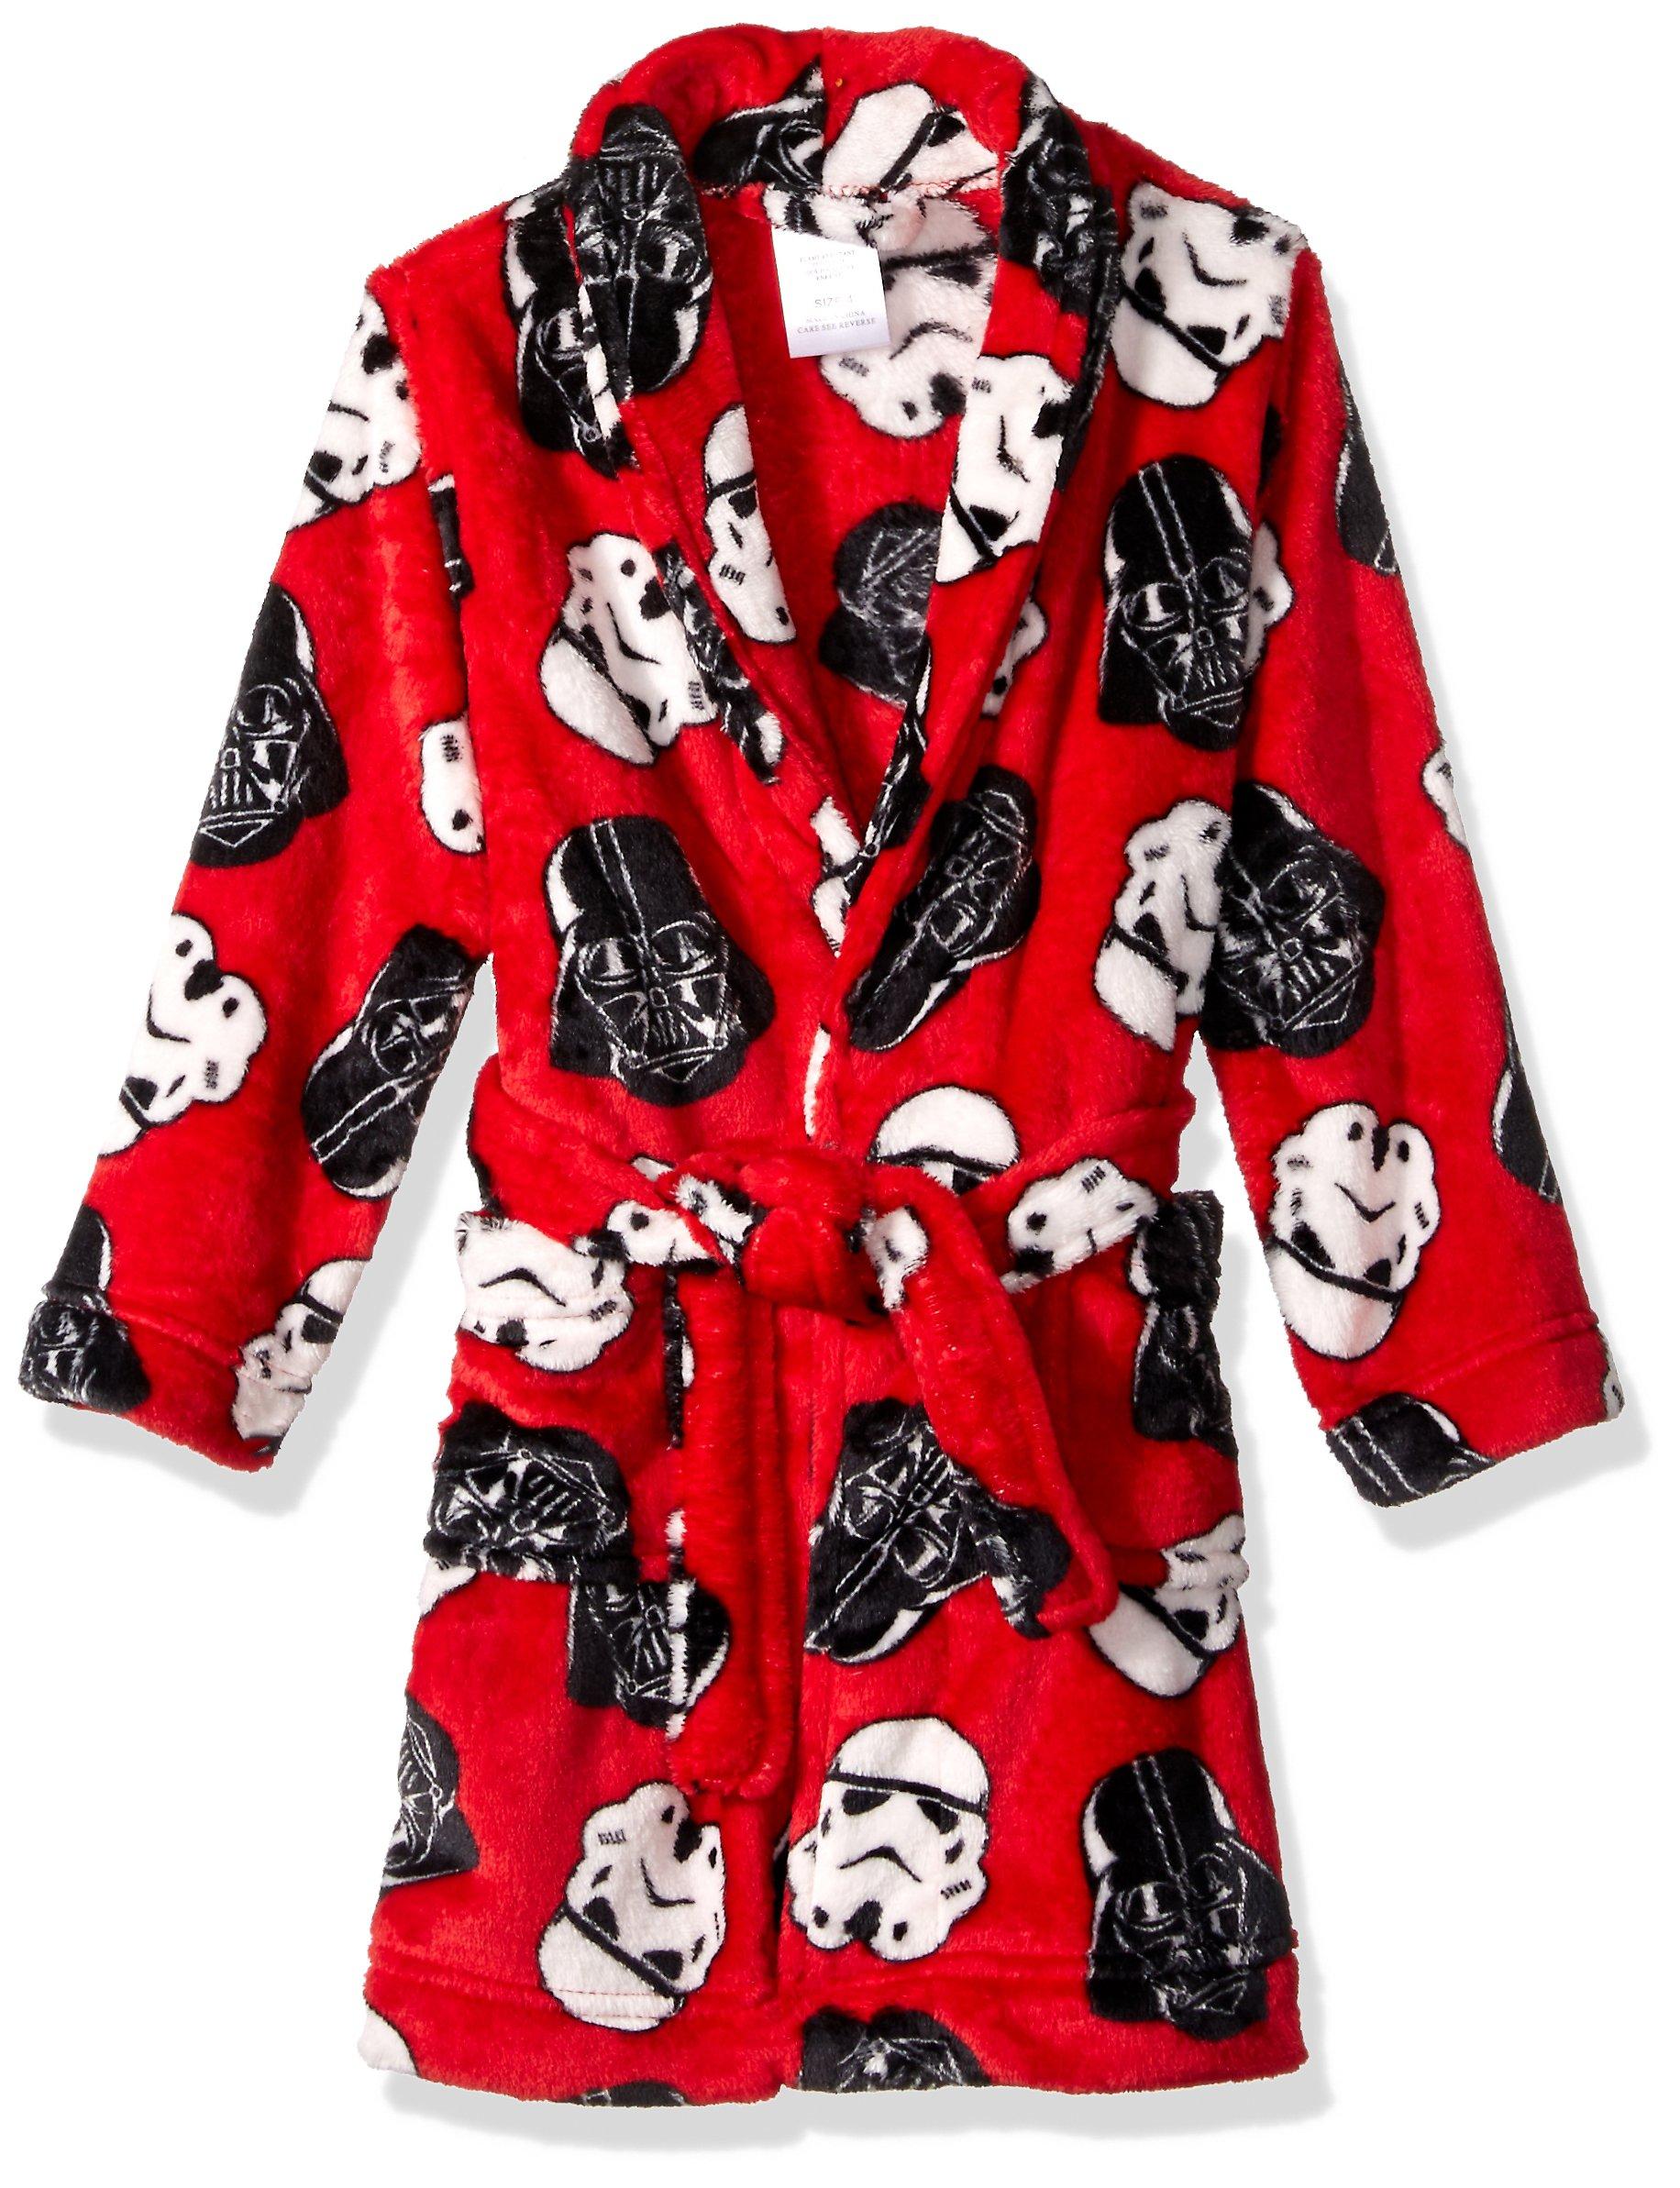 Star Wars Boys' Big Robe, red, 8